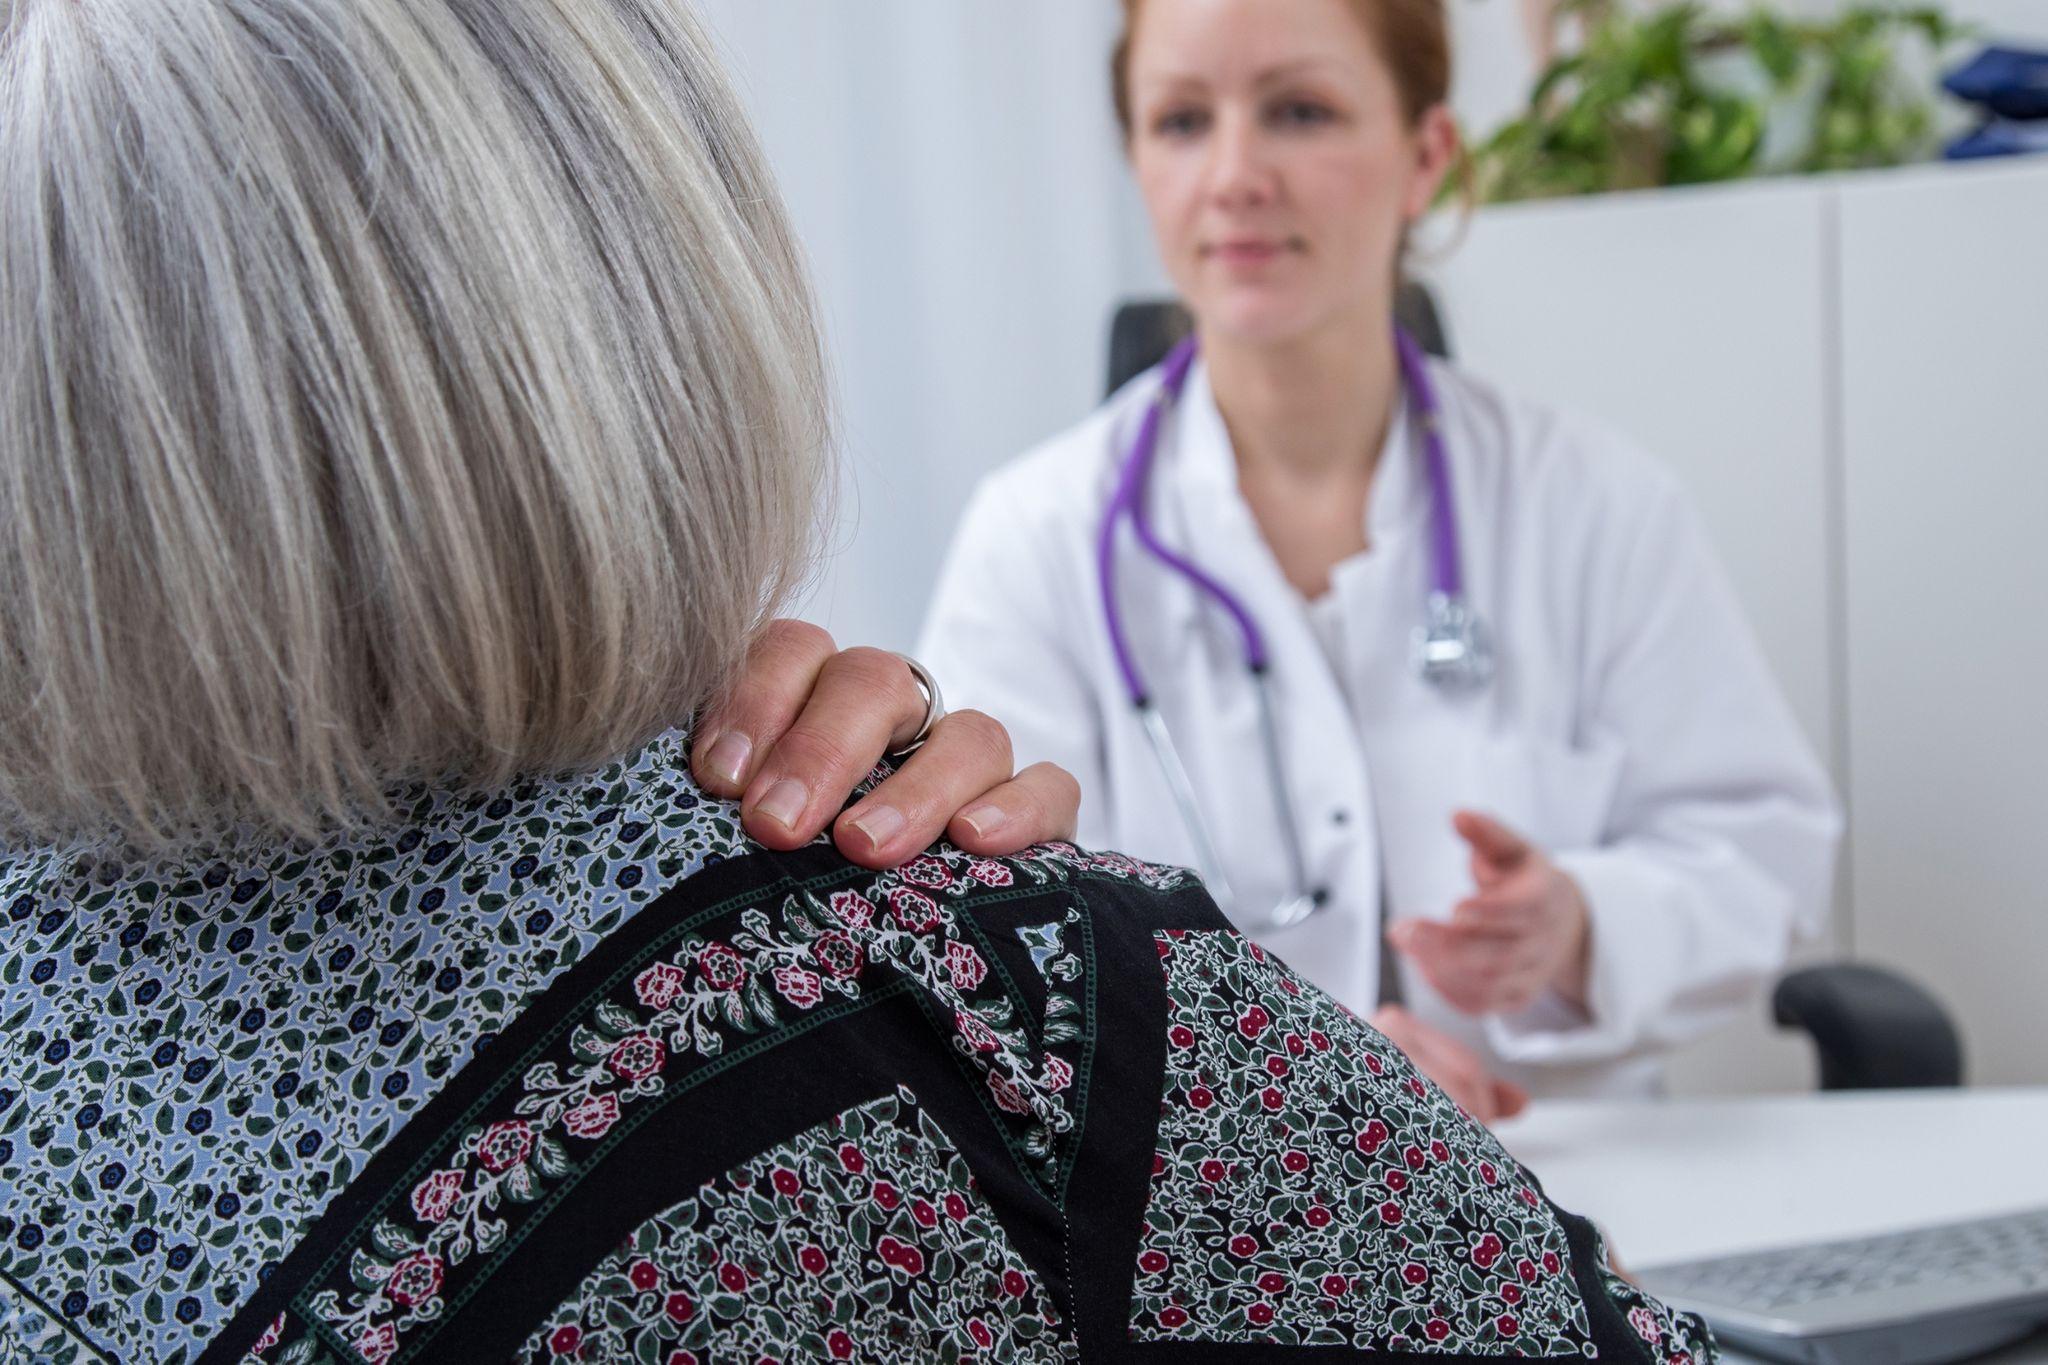 Wann eine Begleitung zum Arzt sinnvoll ist| newsflash24.de